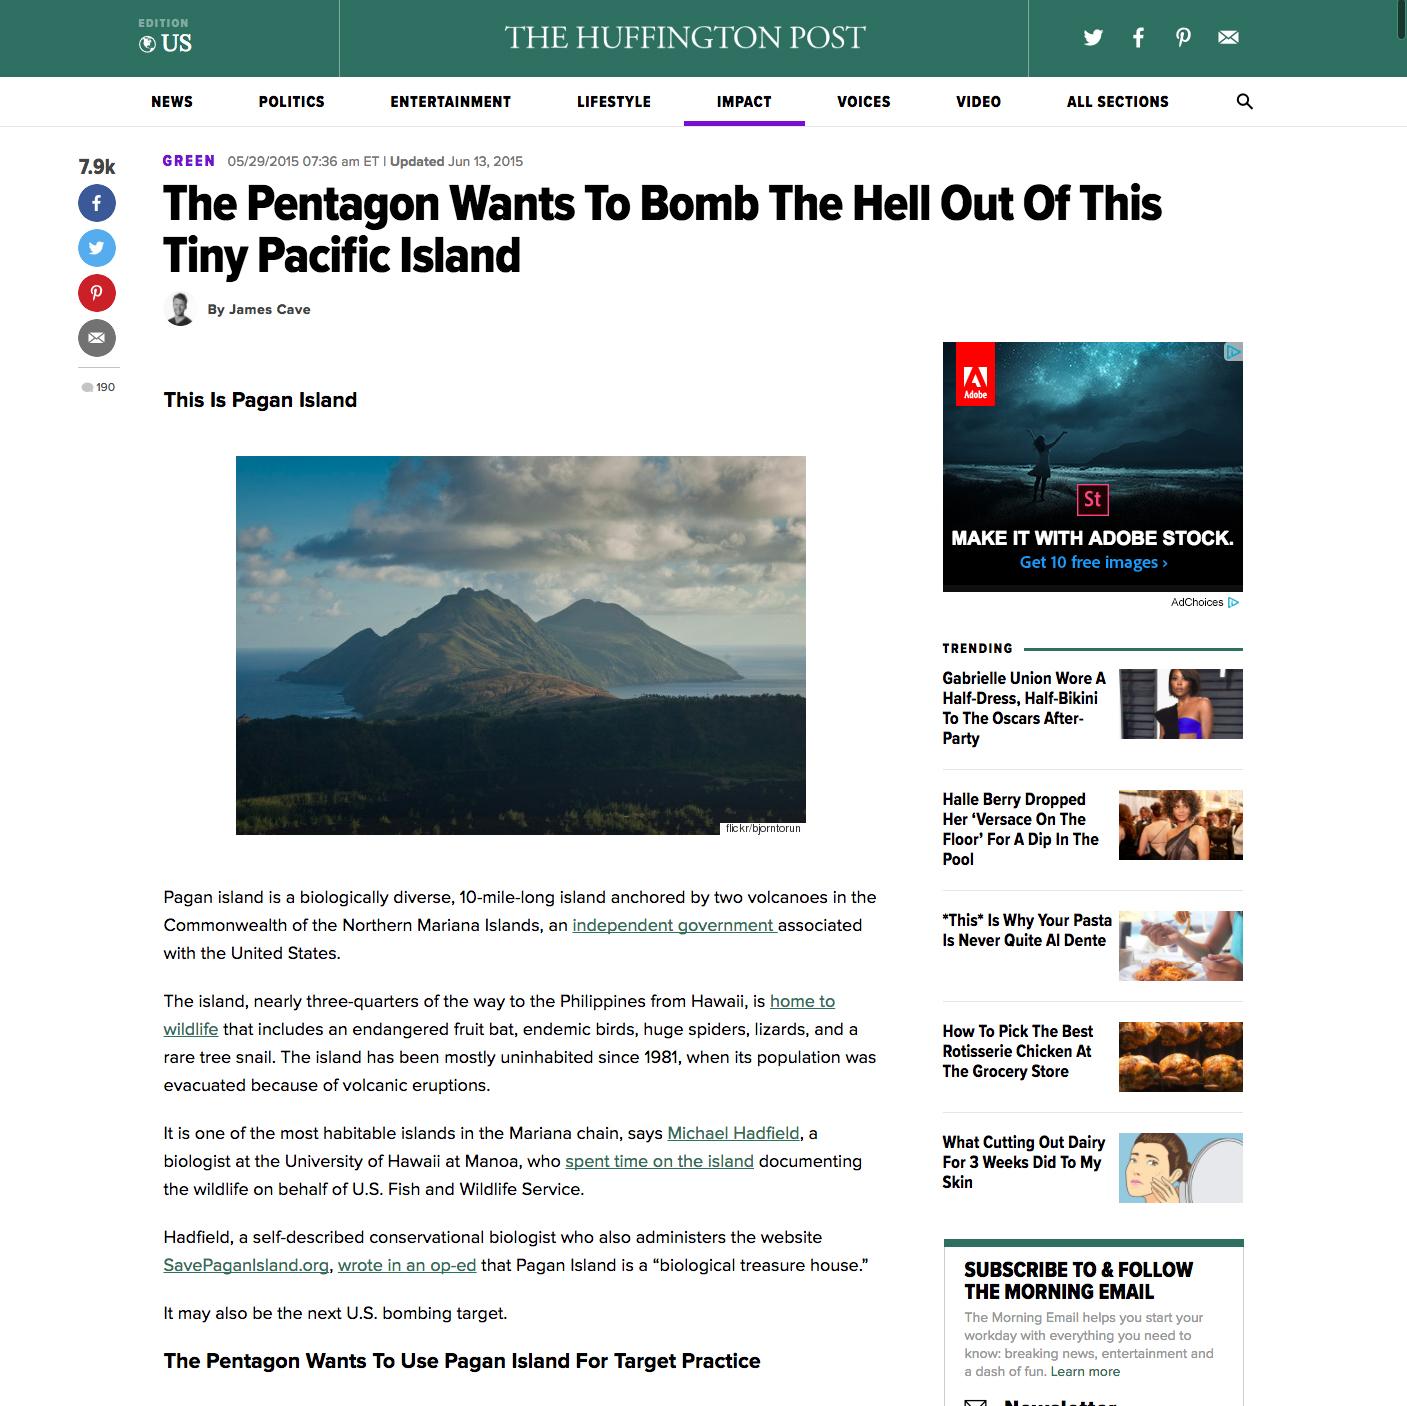 screencapture-huffingtonpost-2015-05-29-pagan-island-marines-military_n_7342168-html-1488393785876.jpg